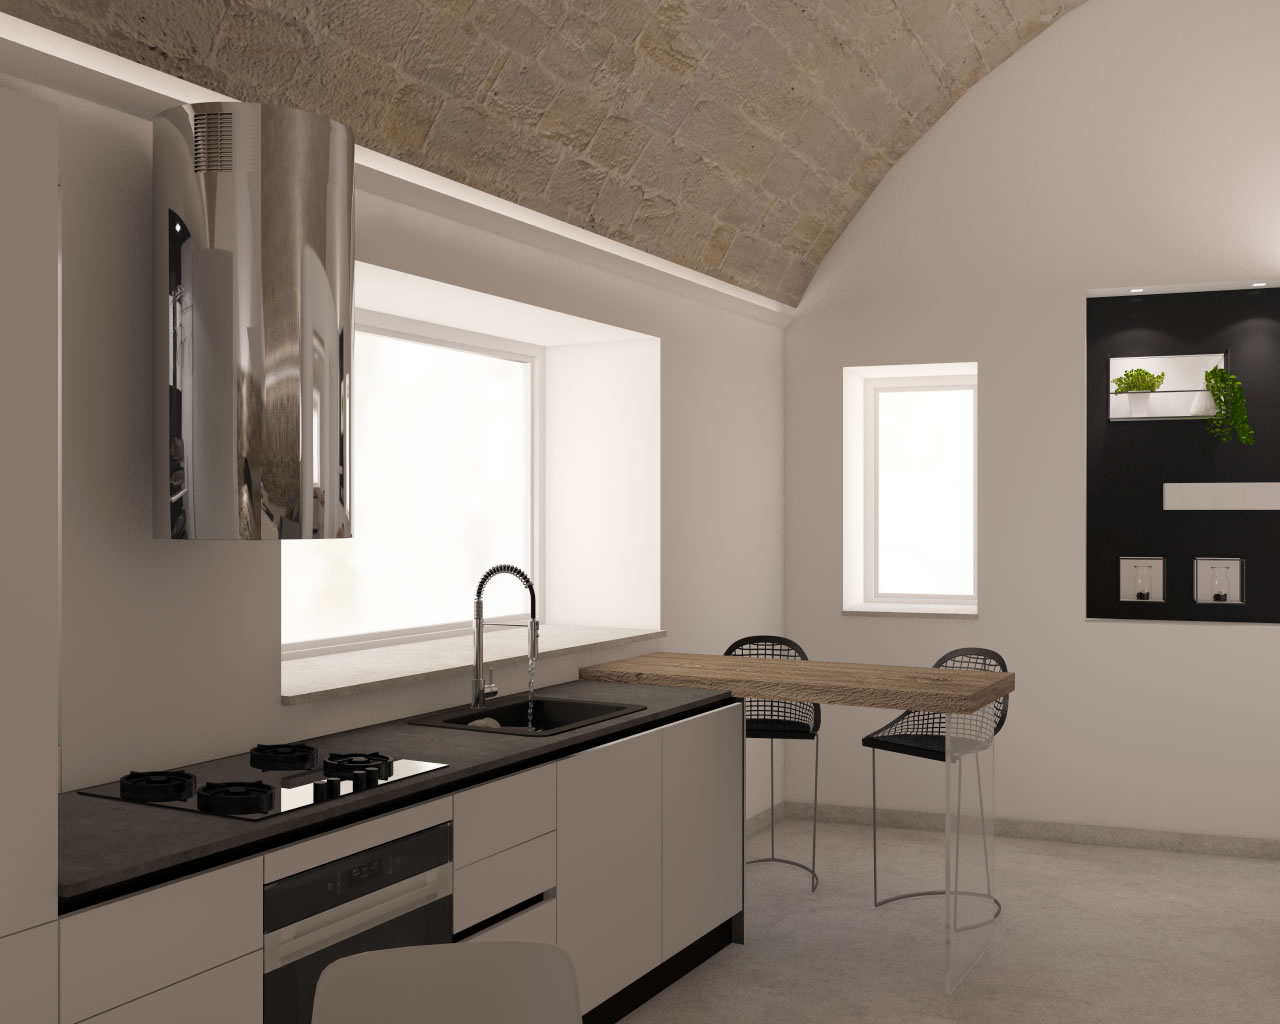 casai-d-living-cucina-7